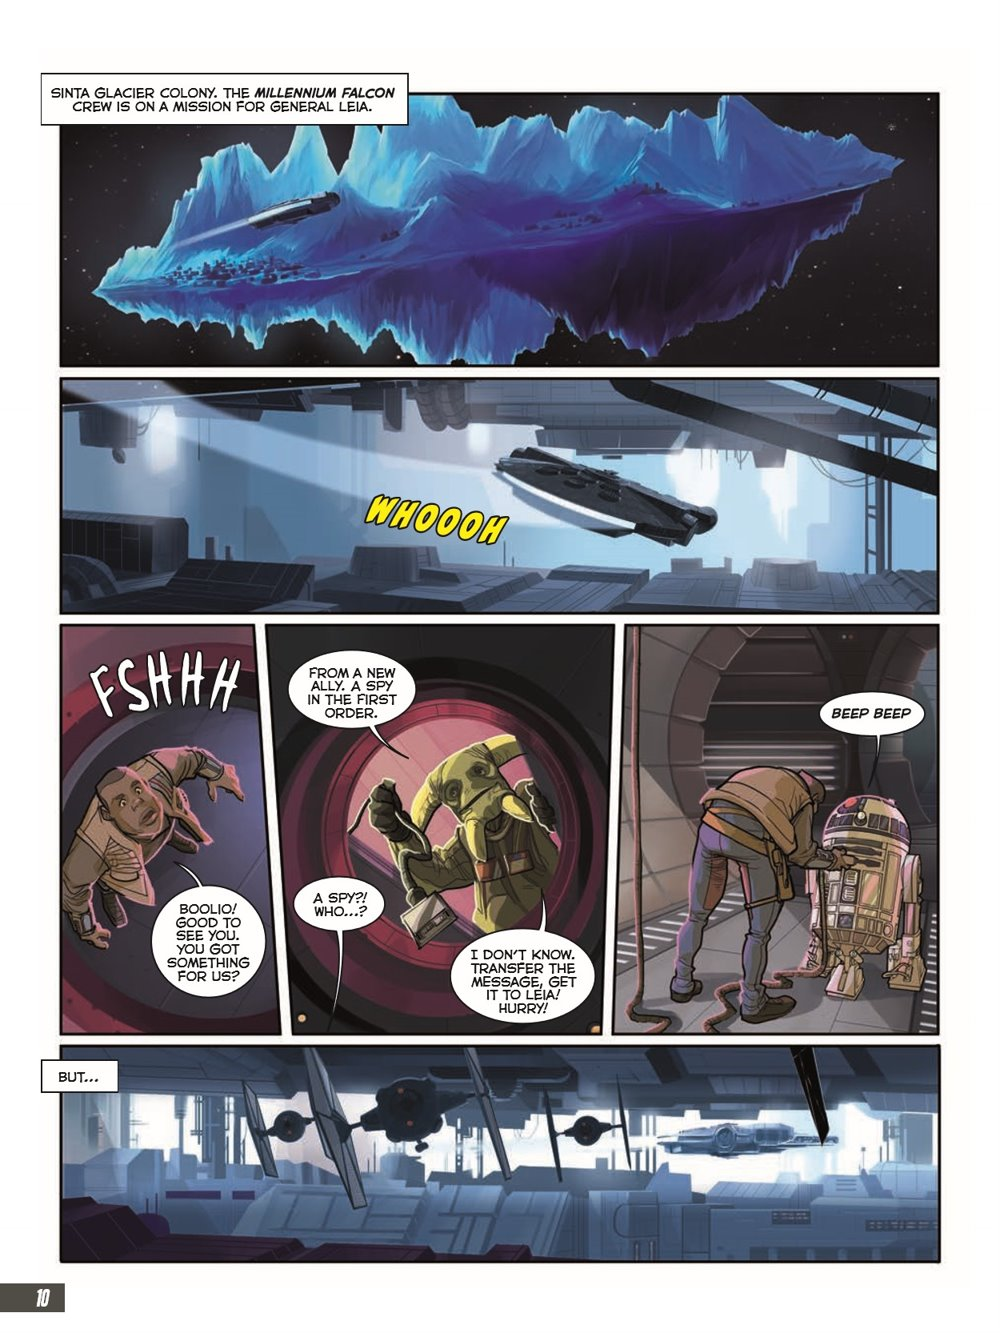 StarWars_IX_TheRiseOfSkywalker_pr-6 ComicList Previews: STAR WARS THE RISE OF SKYWALKER GN